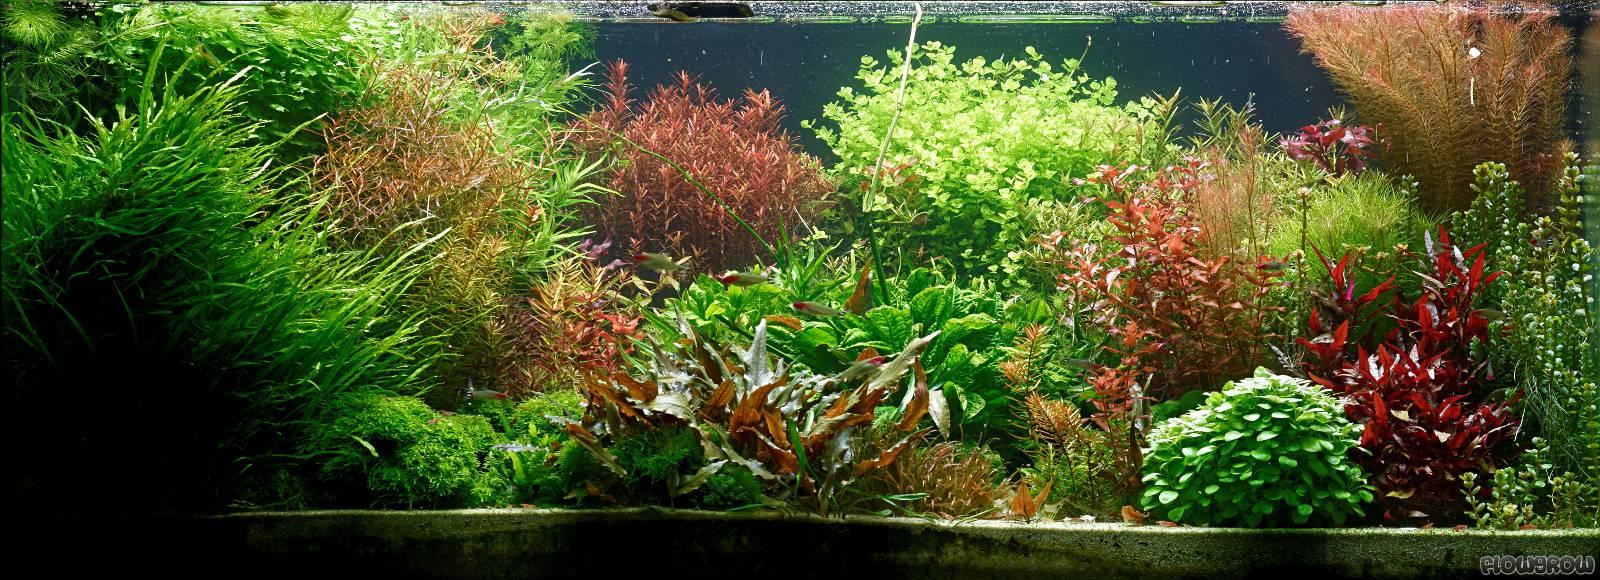 aquarienbeleuchtung steuerbar gestalten led forum. Black Bedroom Furniture Sets. Home Design Ideas